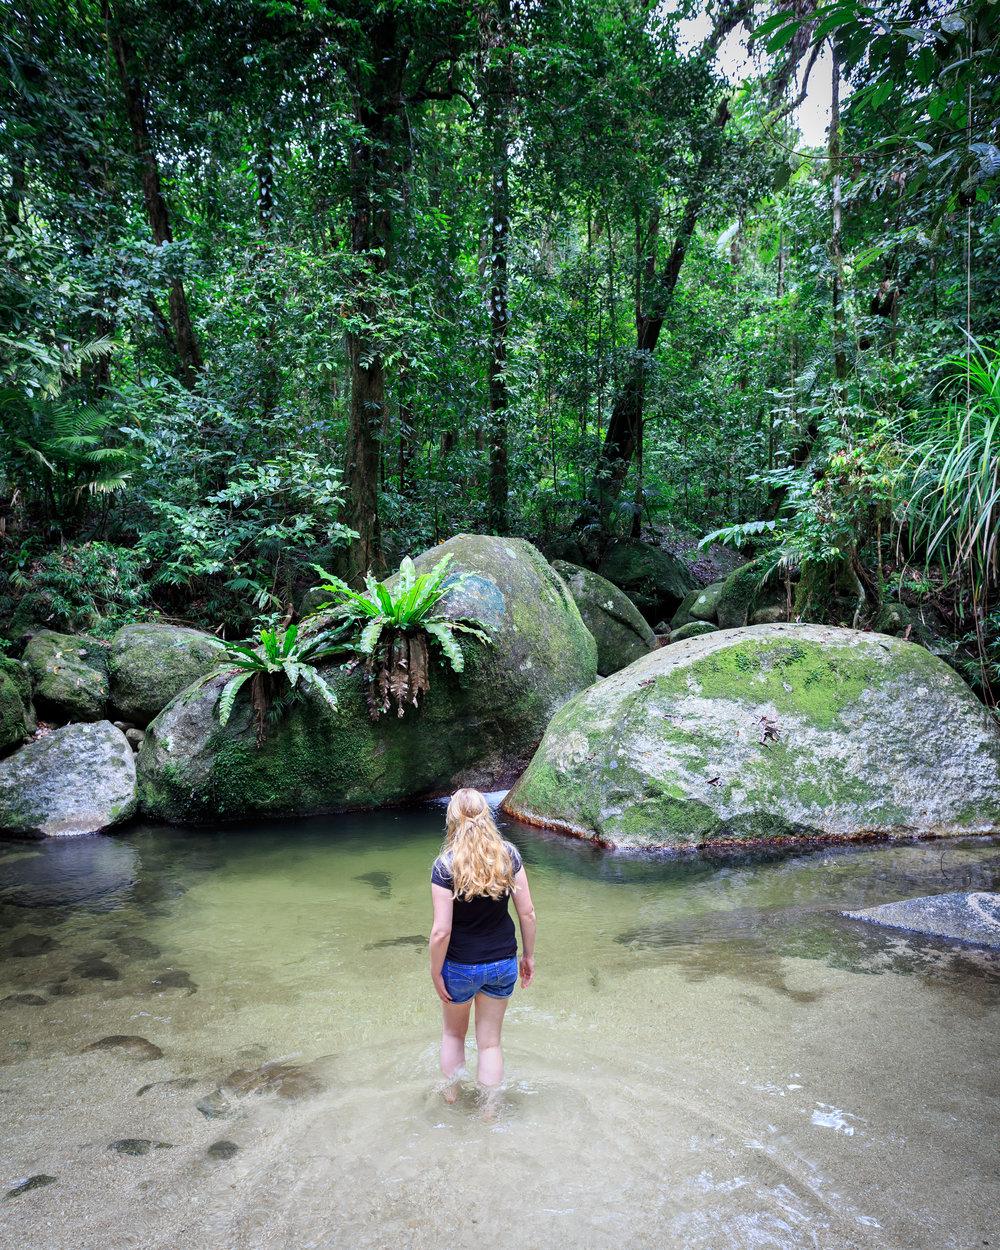 Instagrammable spots Cairns: Mosman Gorge